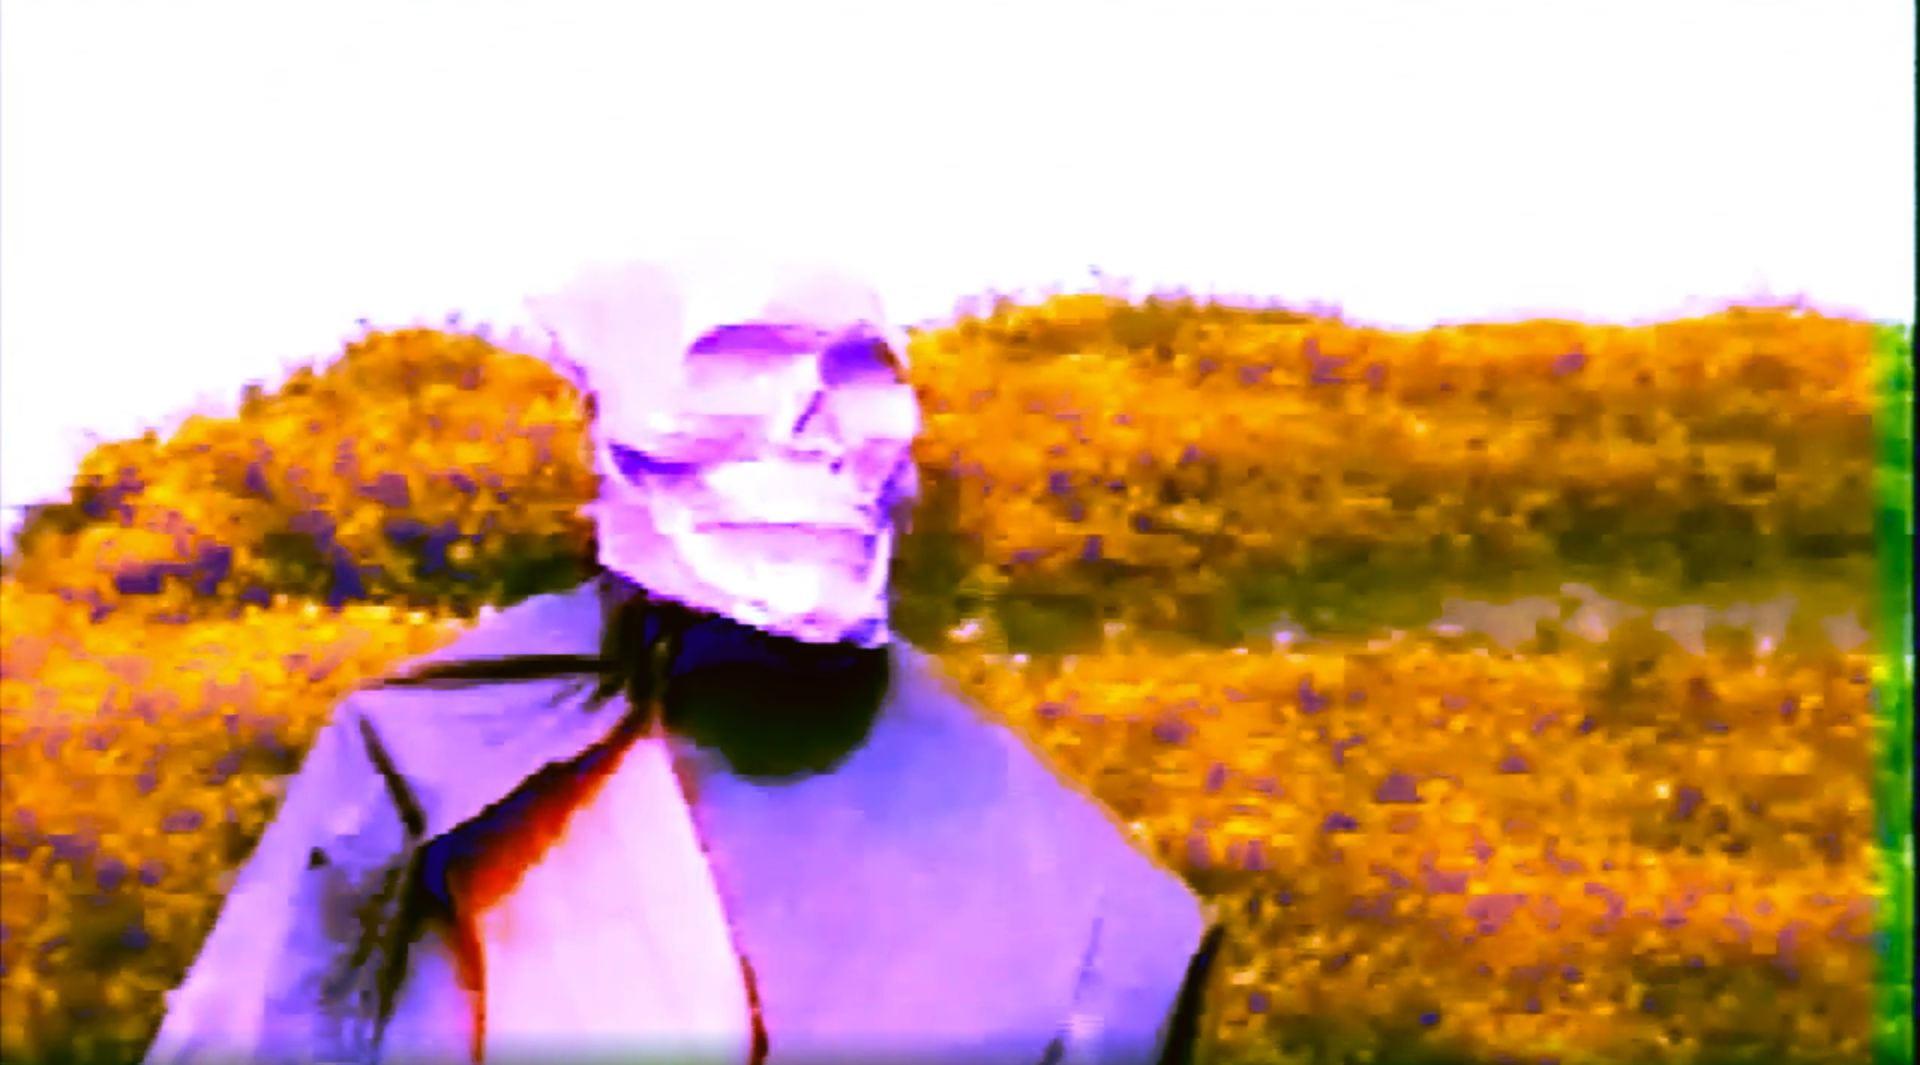 experimental film art video limbo dante death skull hi8 camera